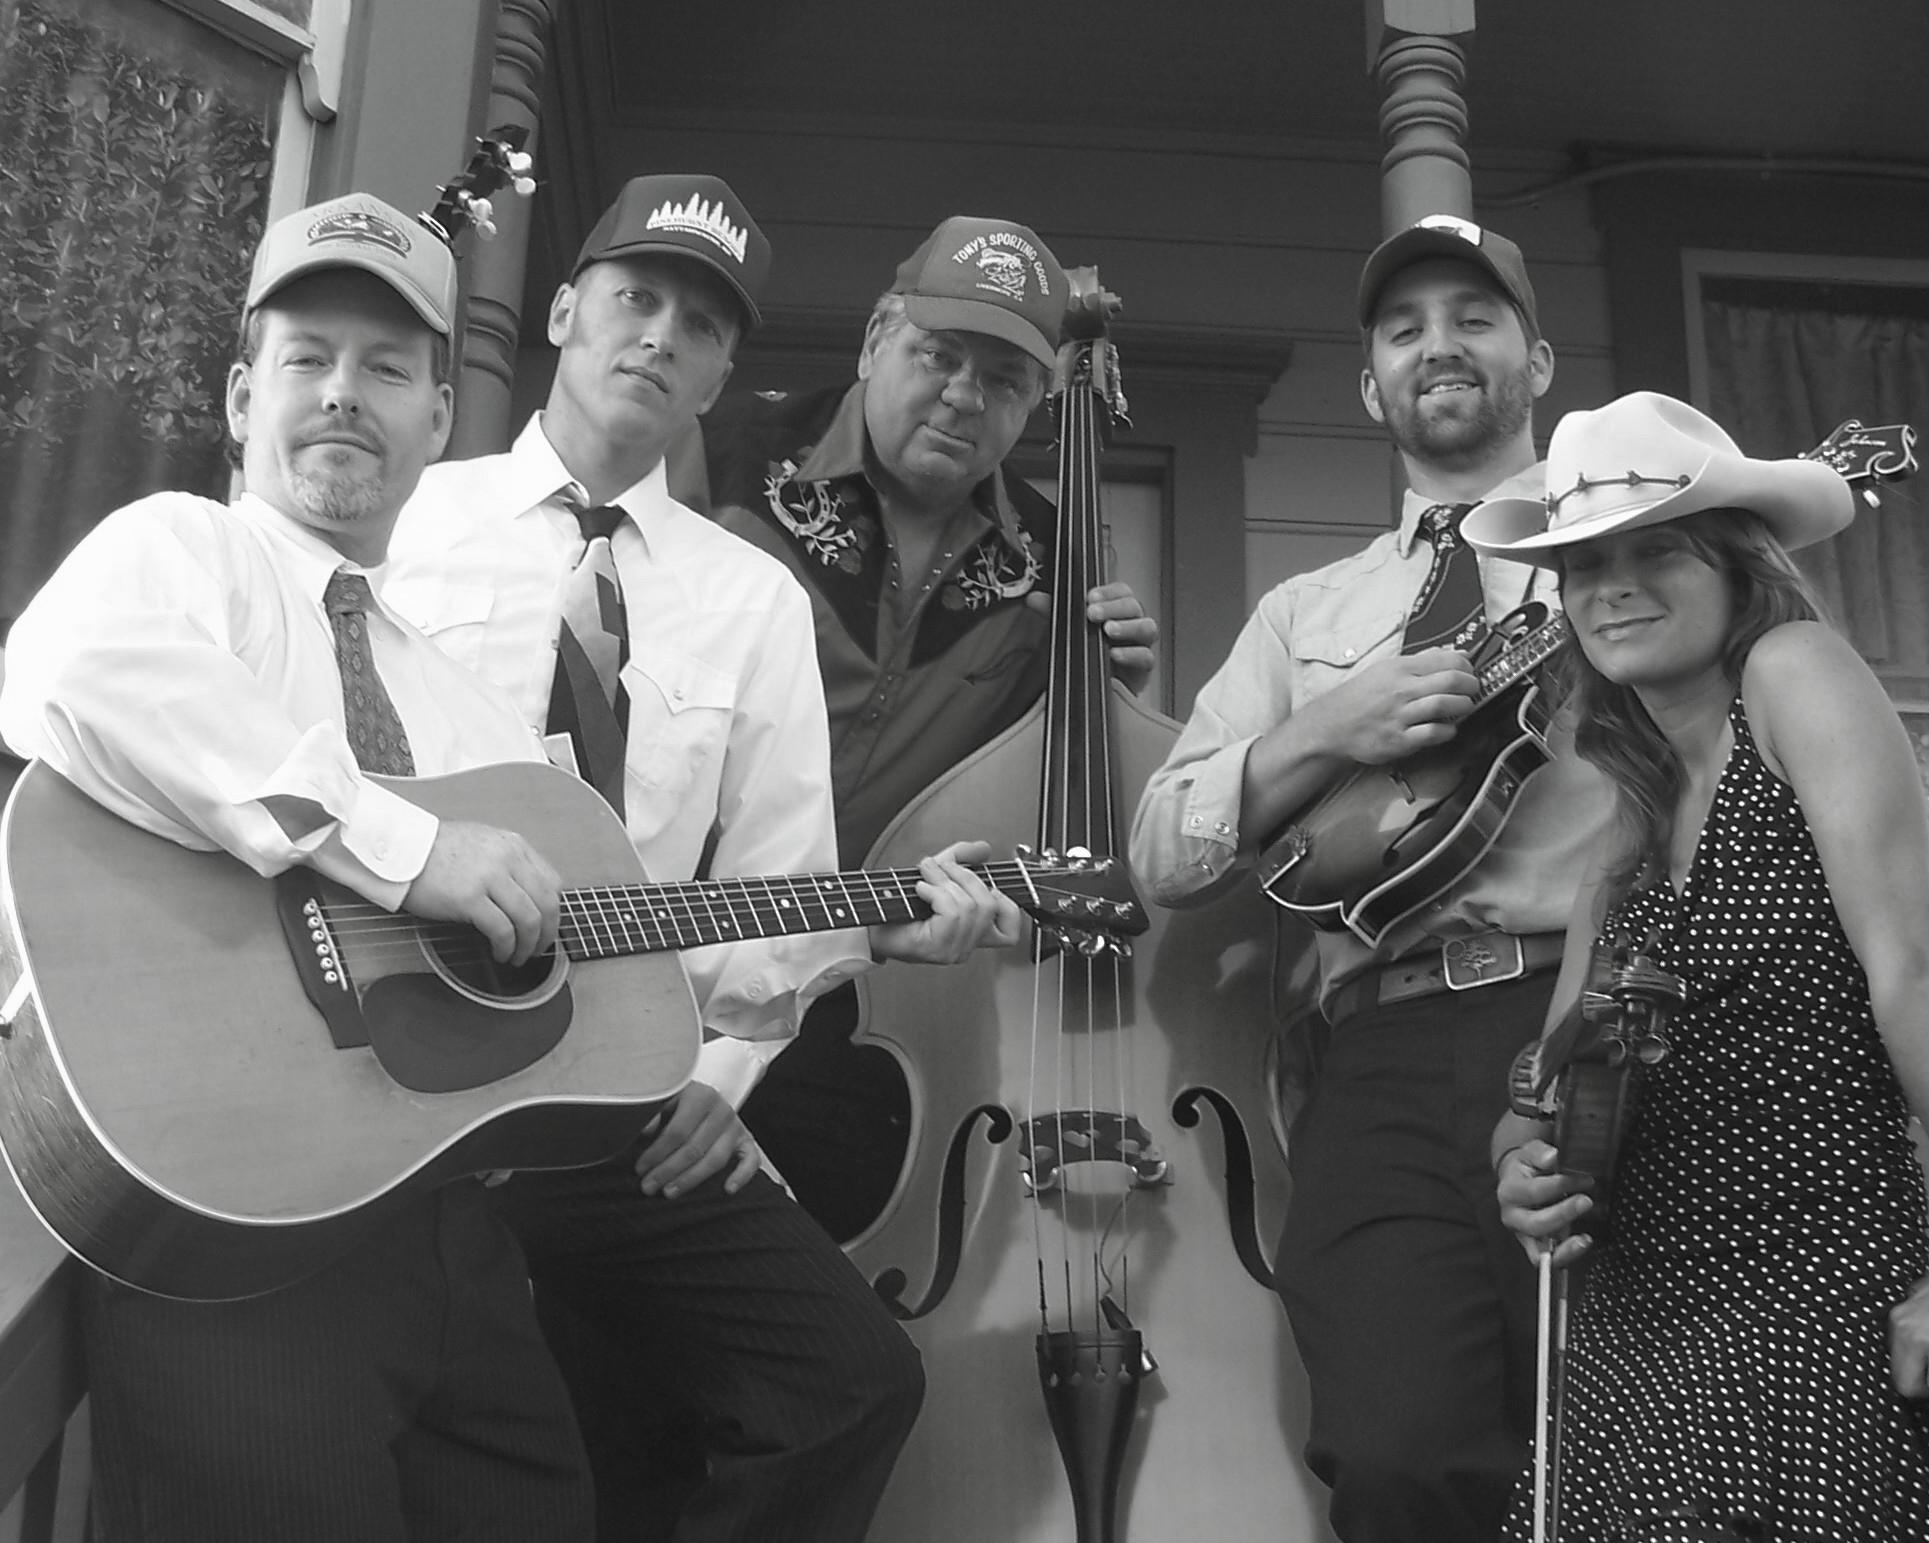 Still Searchin' Band photo 2006